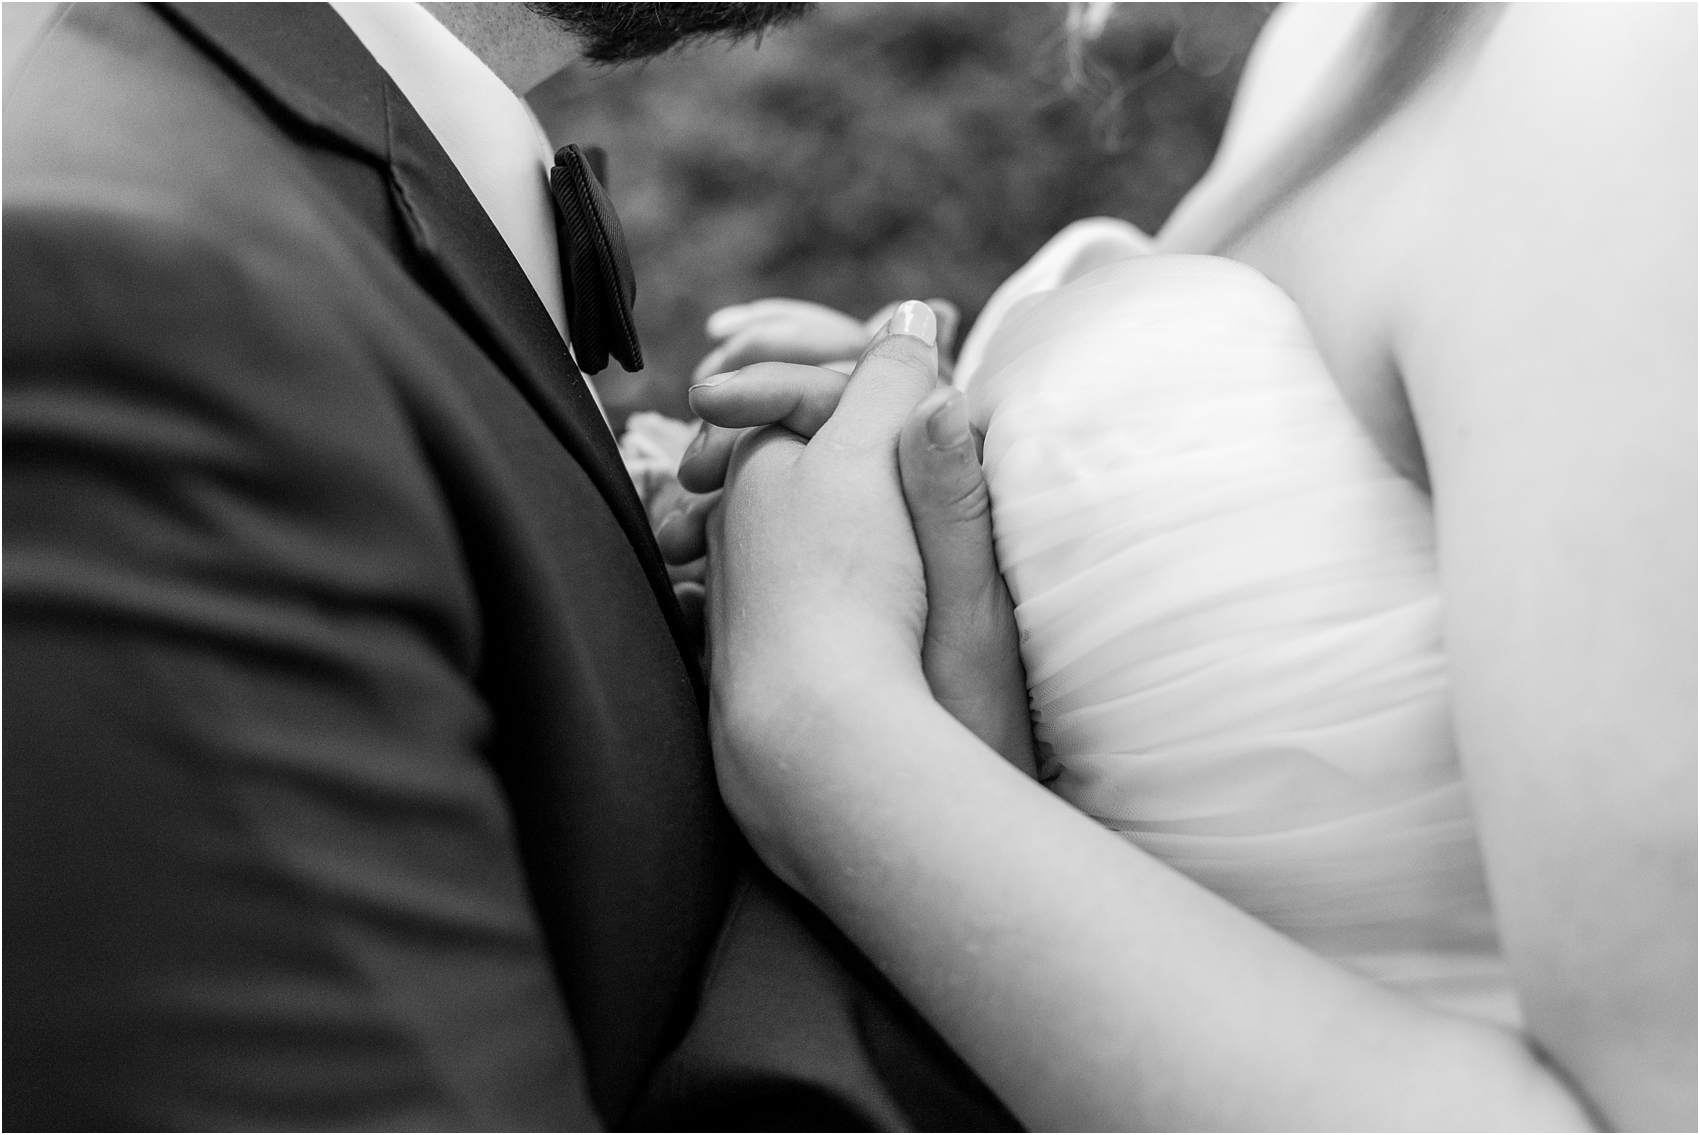 joyful-and-candid-navy-blush-wedding-photos-at-crystal-gardens-in-howell-mi-by-courtney-carolyn-photography_0097.jpg